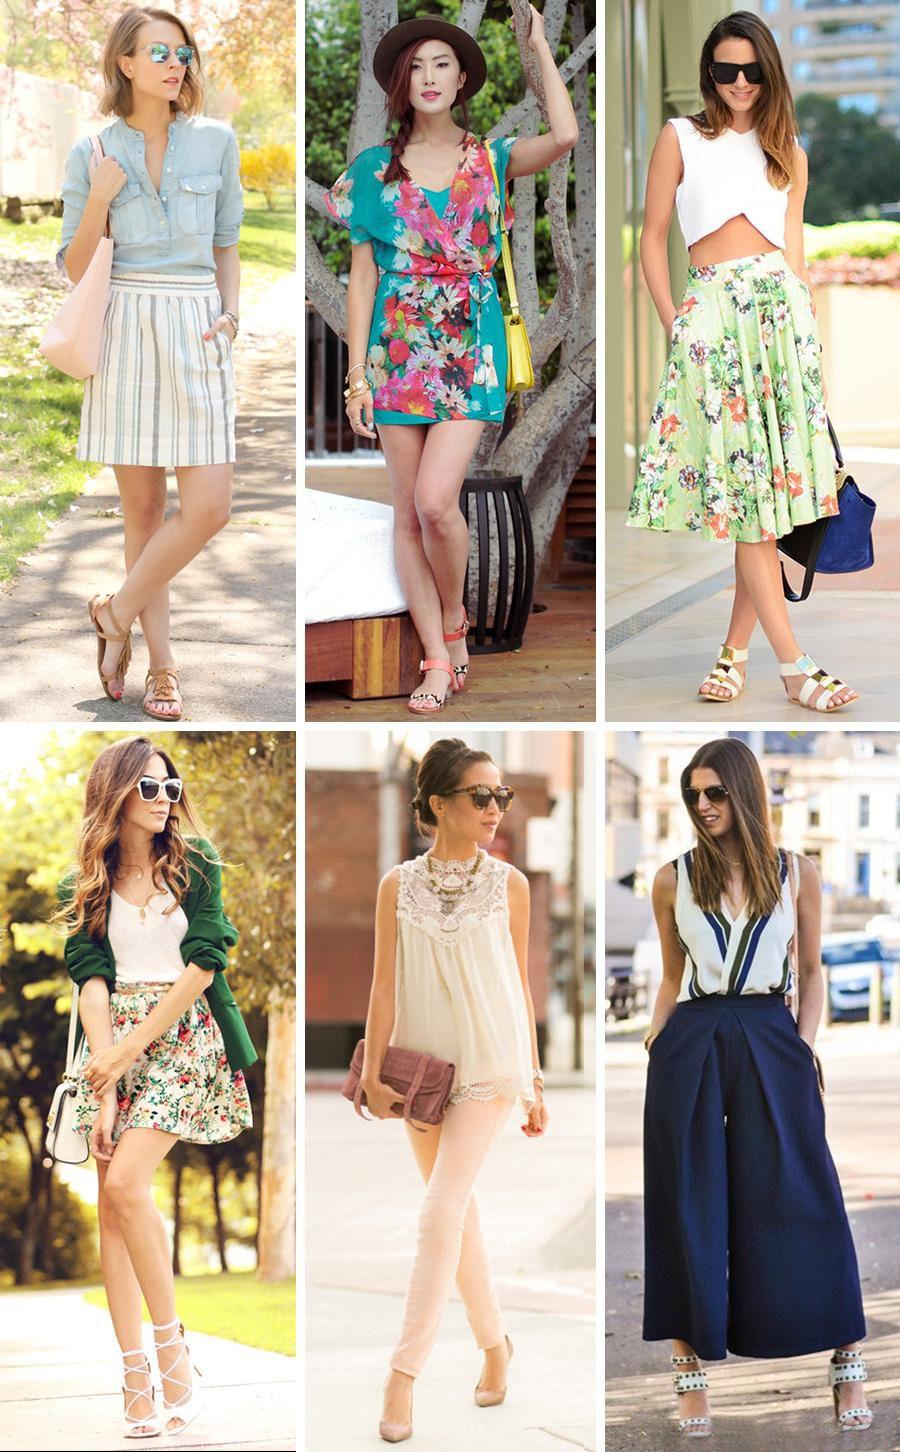 9e2808d820a Уличная мода весна-лето 2016